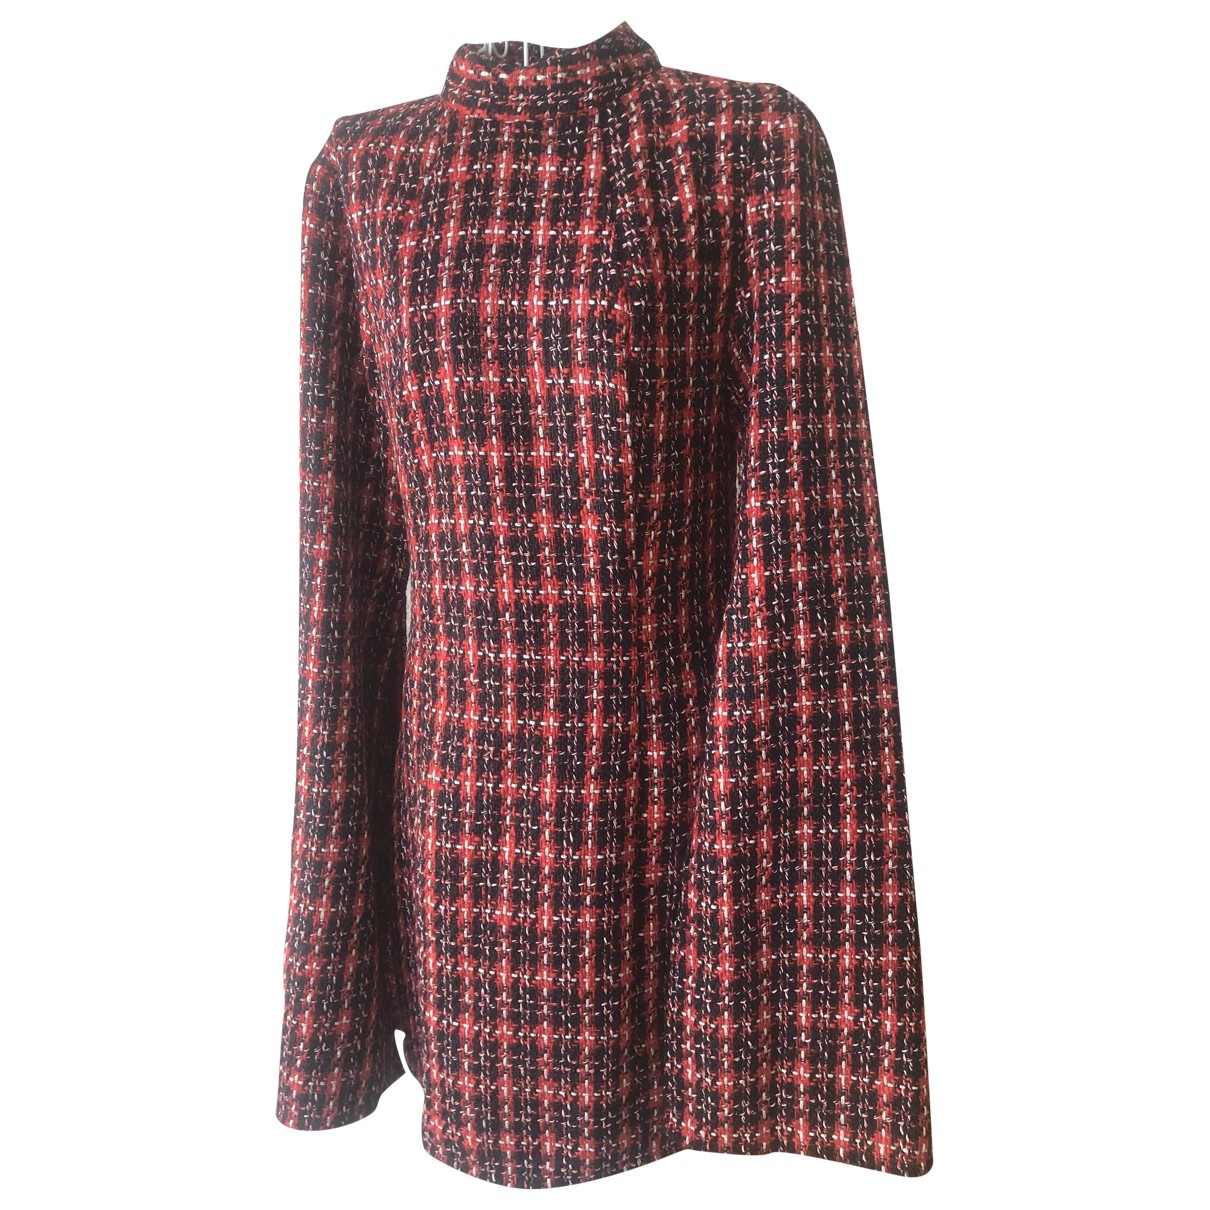 Non Signe / Unsigned \N Kleid in  Bordeauxrot Tweed